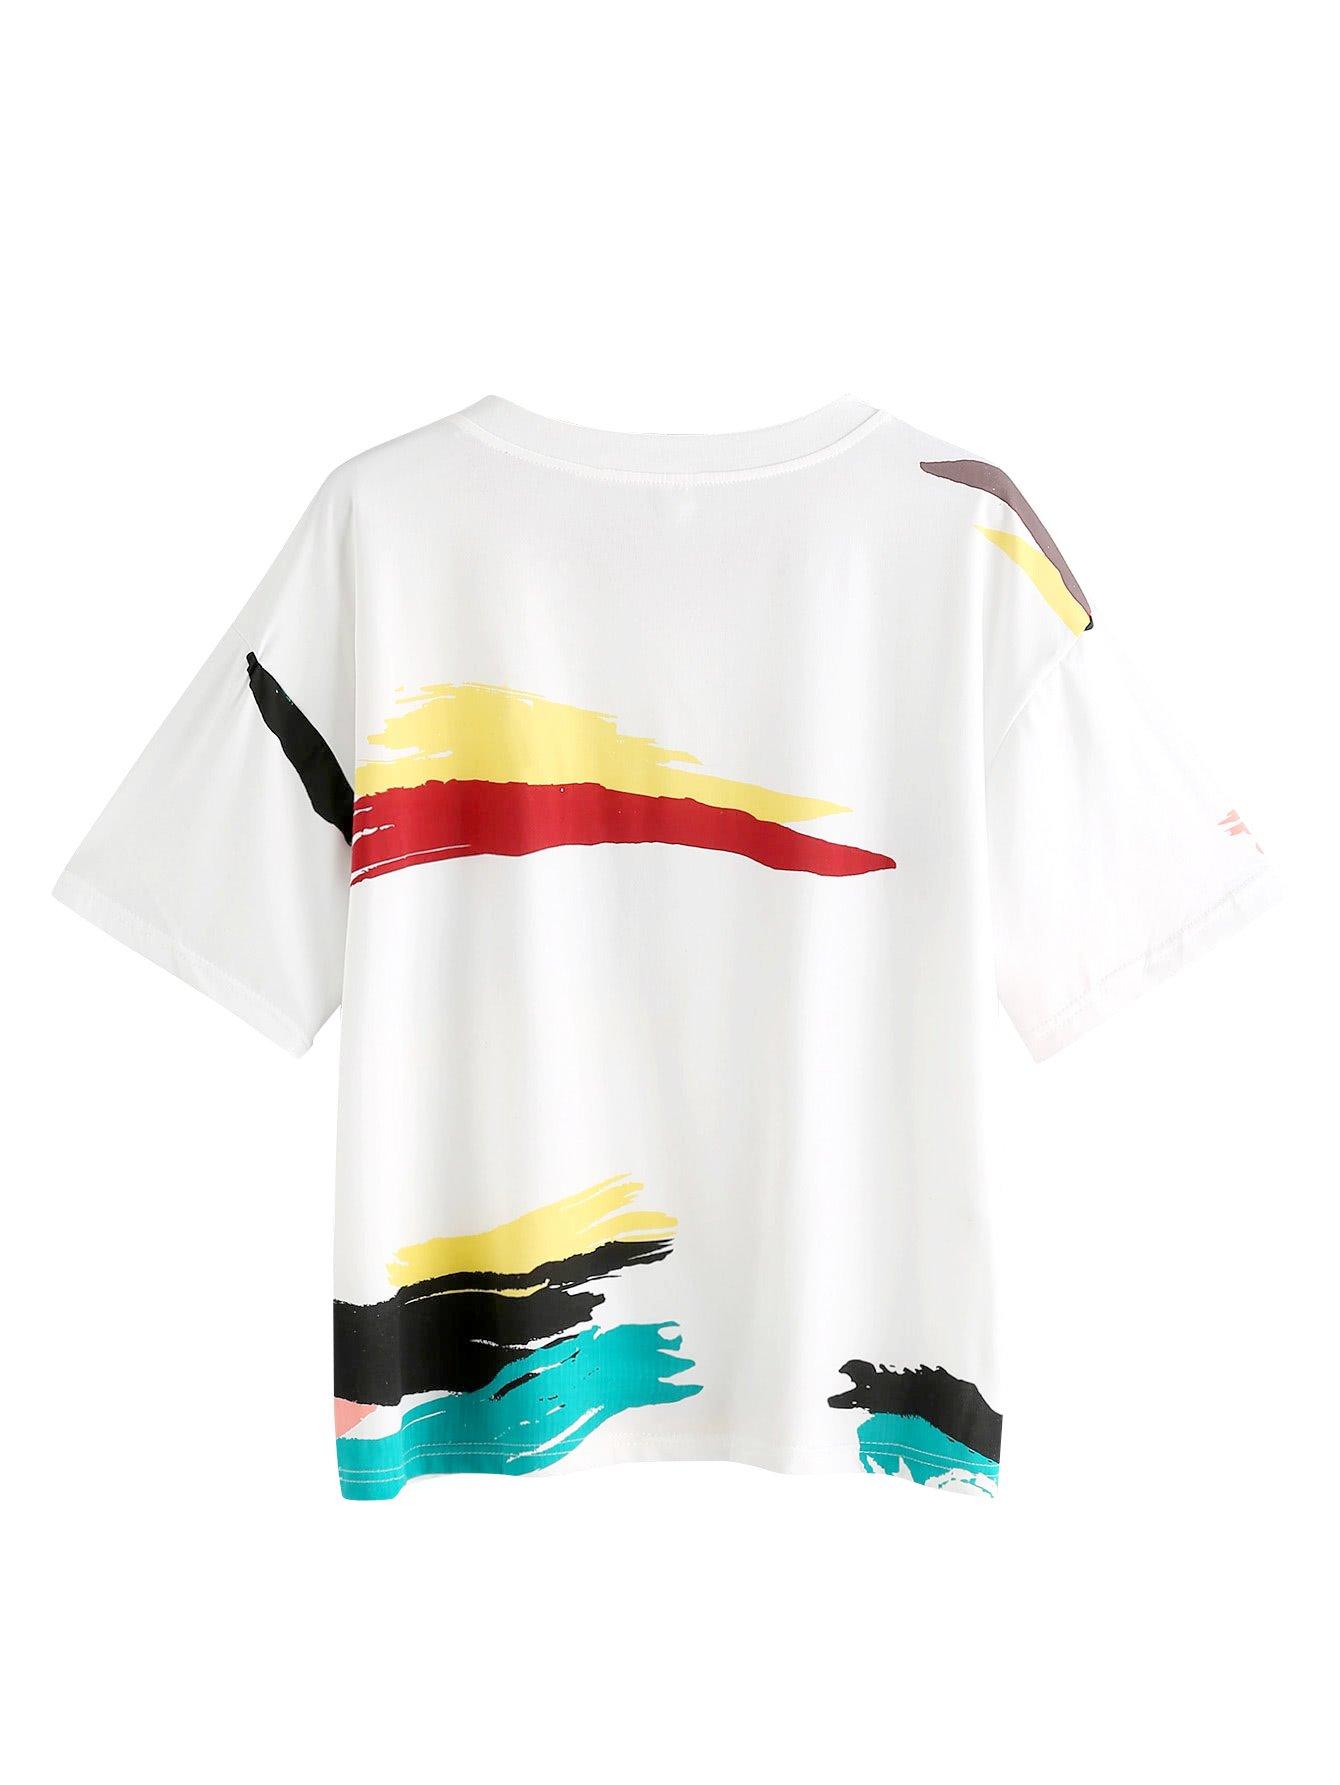 83f185170fd Romwe Women s Cute Graffiti T-Shirt Color Print Tee Top   Knits   Tees    Clothing